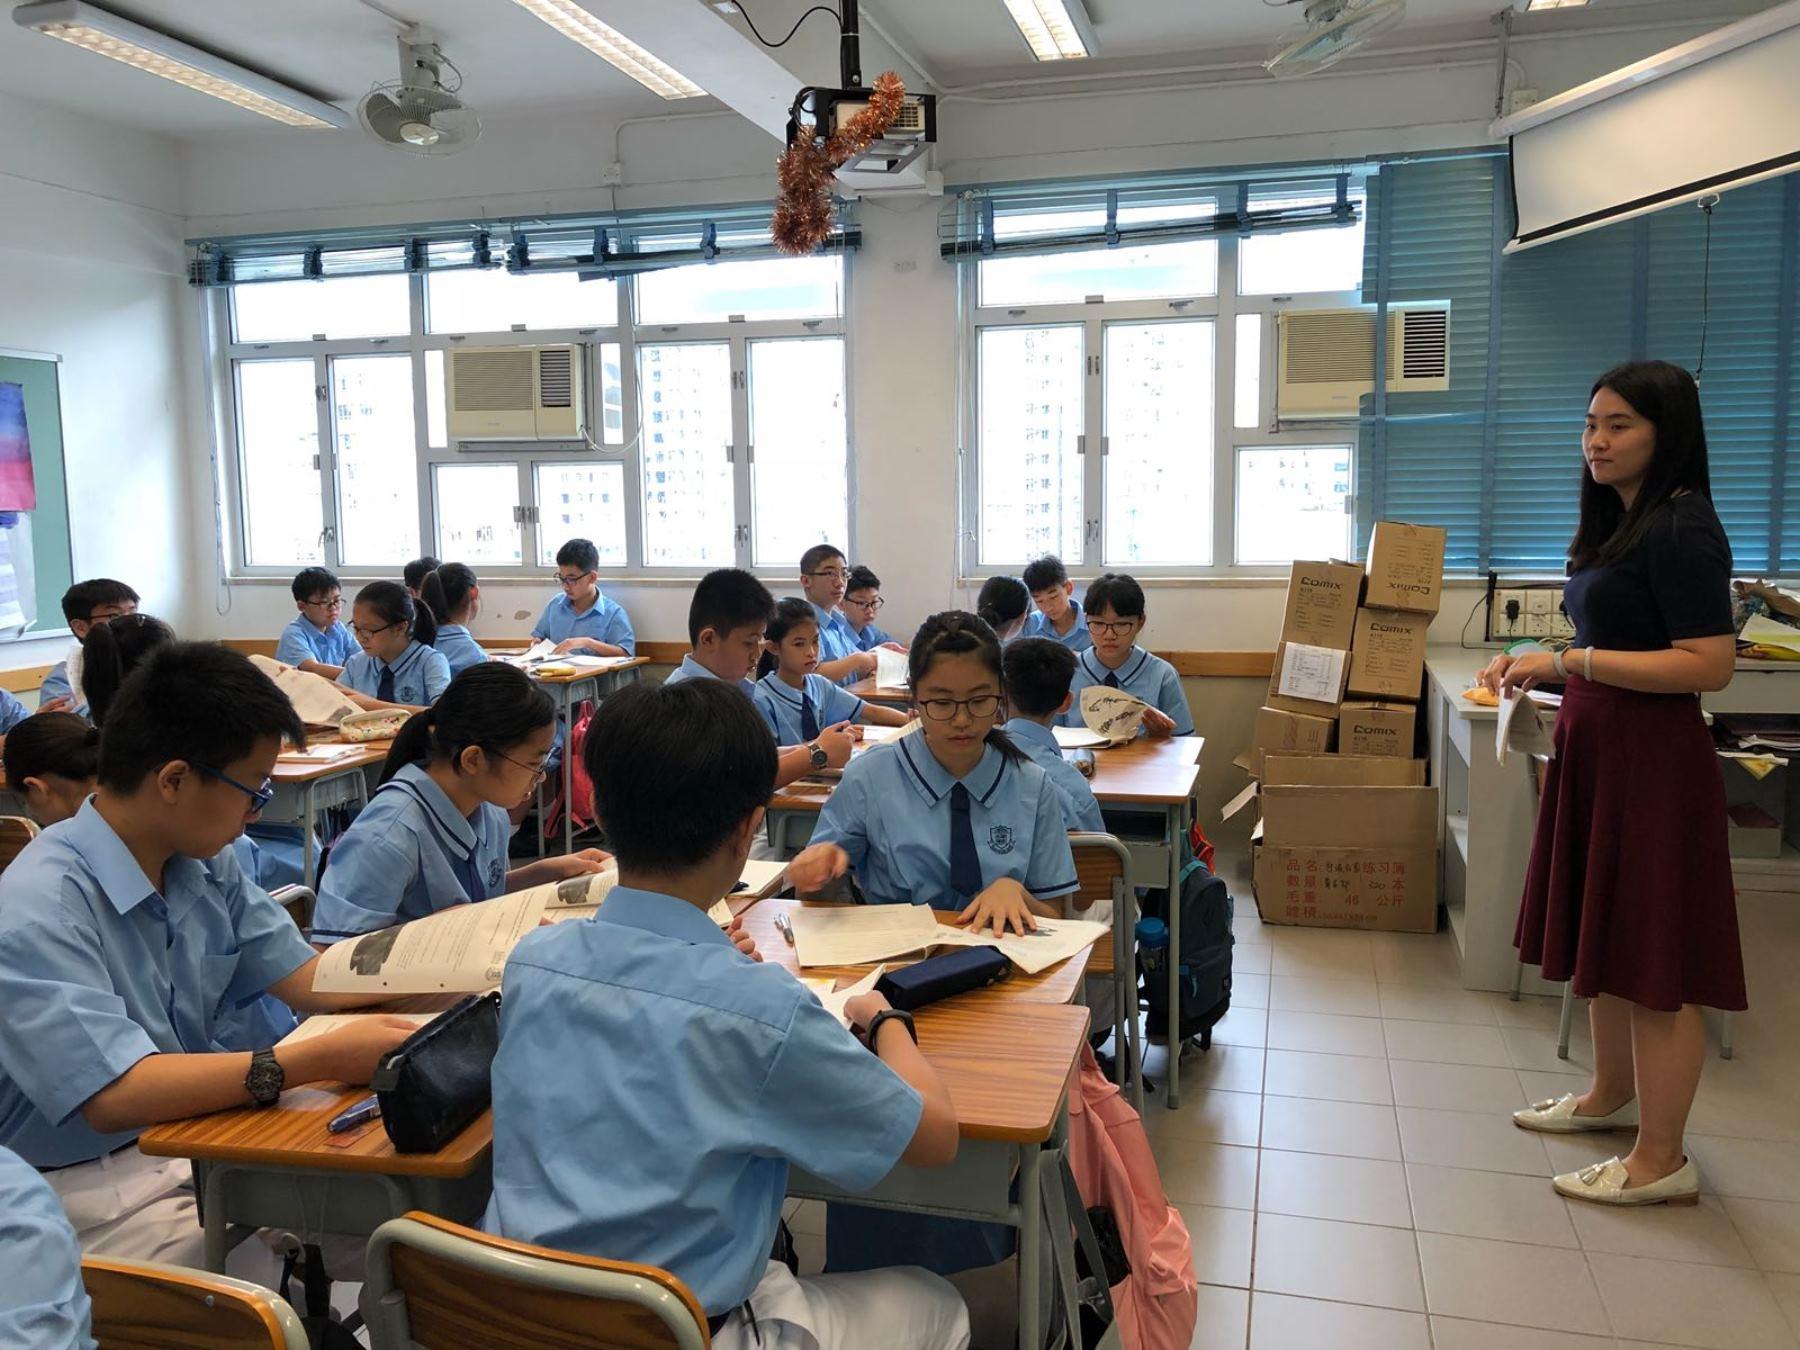 http://npc.edu.hk/sites/default/files/1_23.jpeg